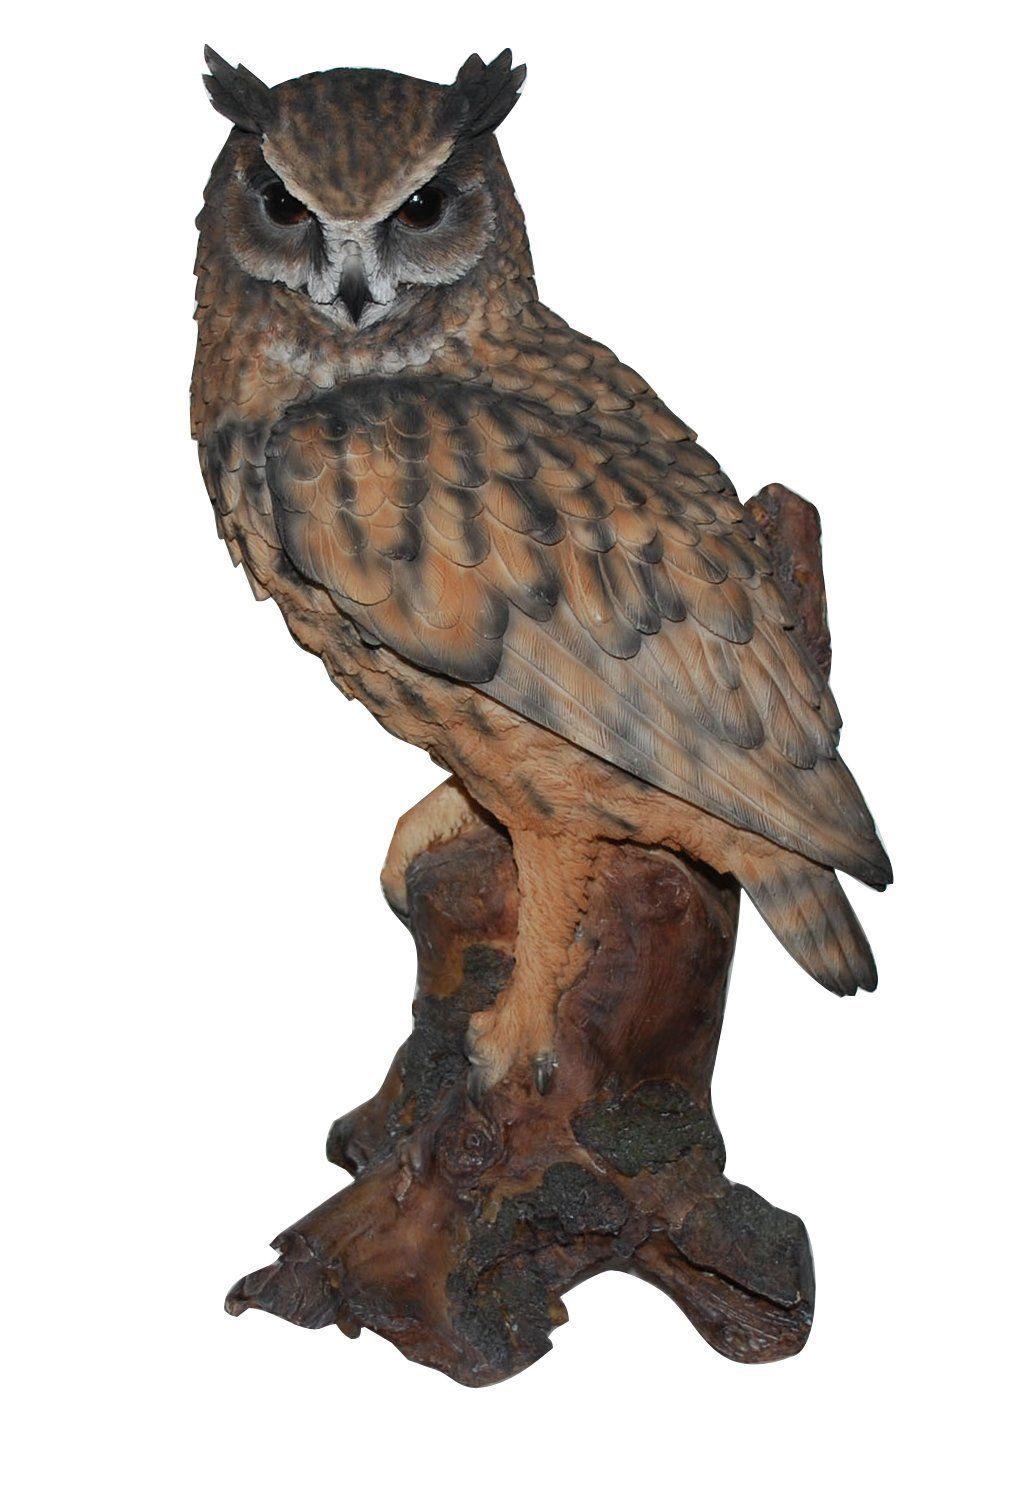 Real Life Large Long Eared Owl Garden Ornament (SizeB): Amazon.co.uk: Garden & Outdoors